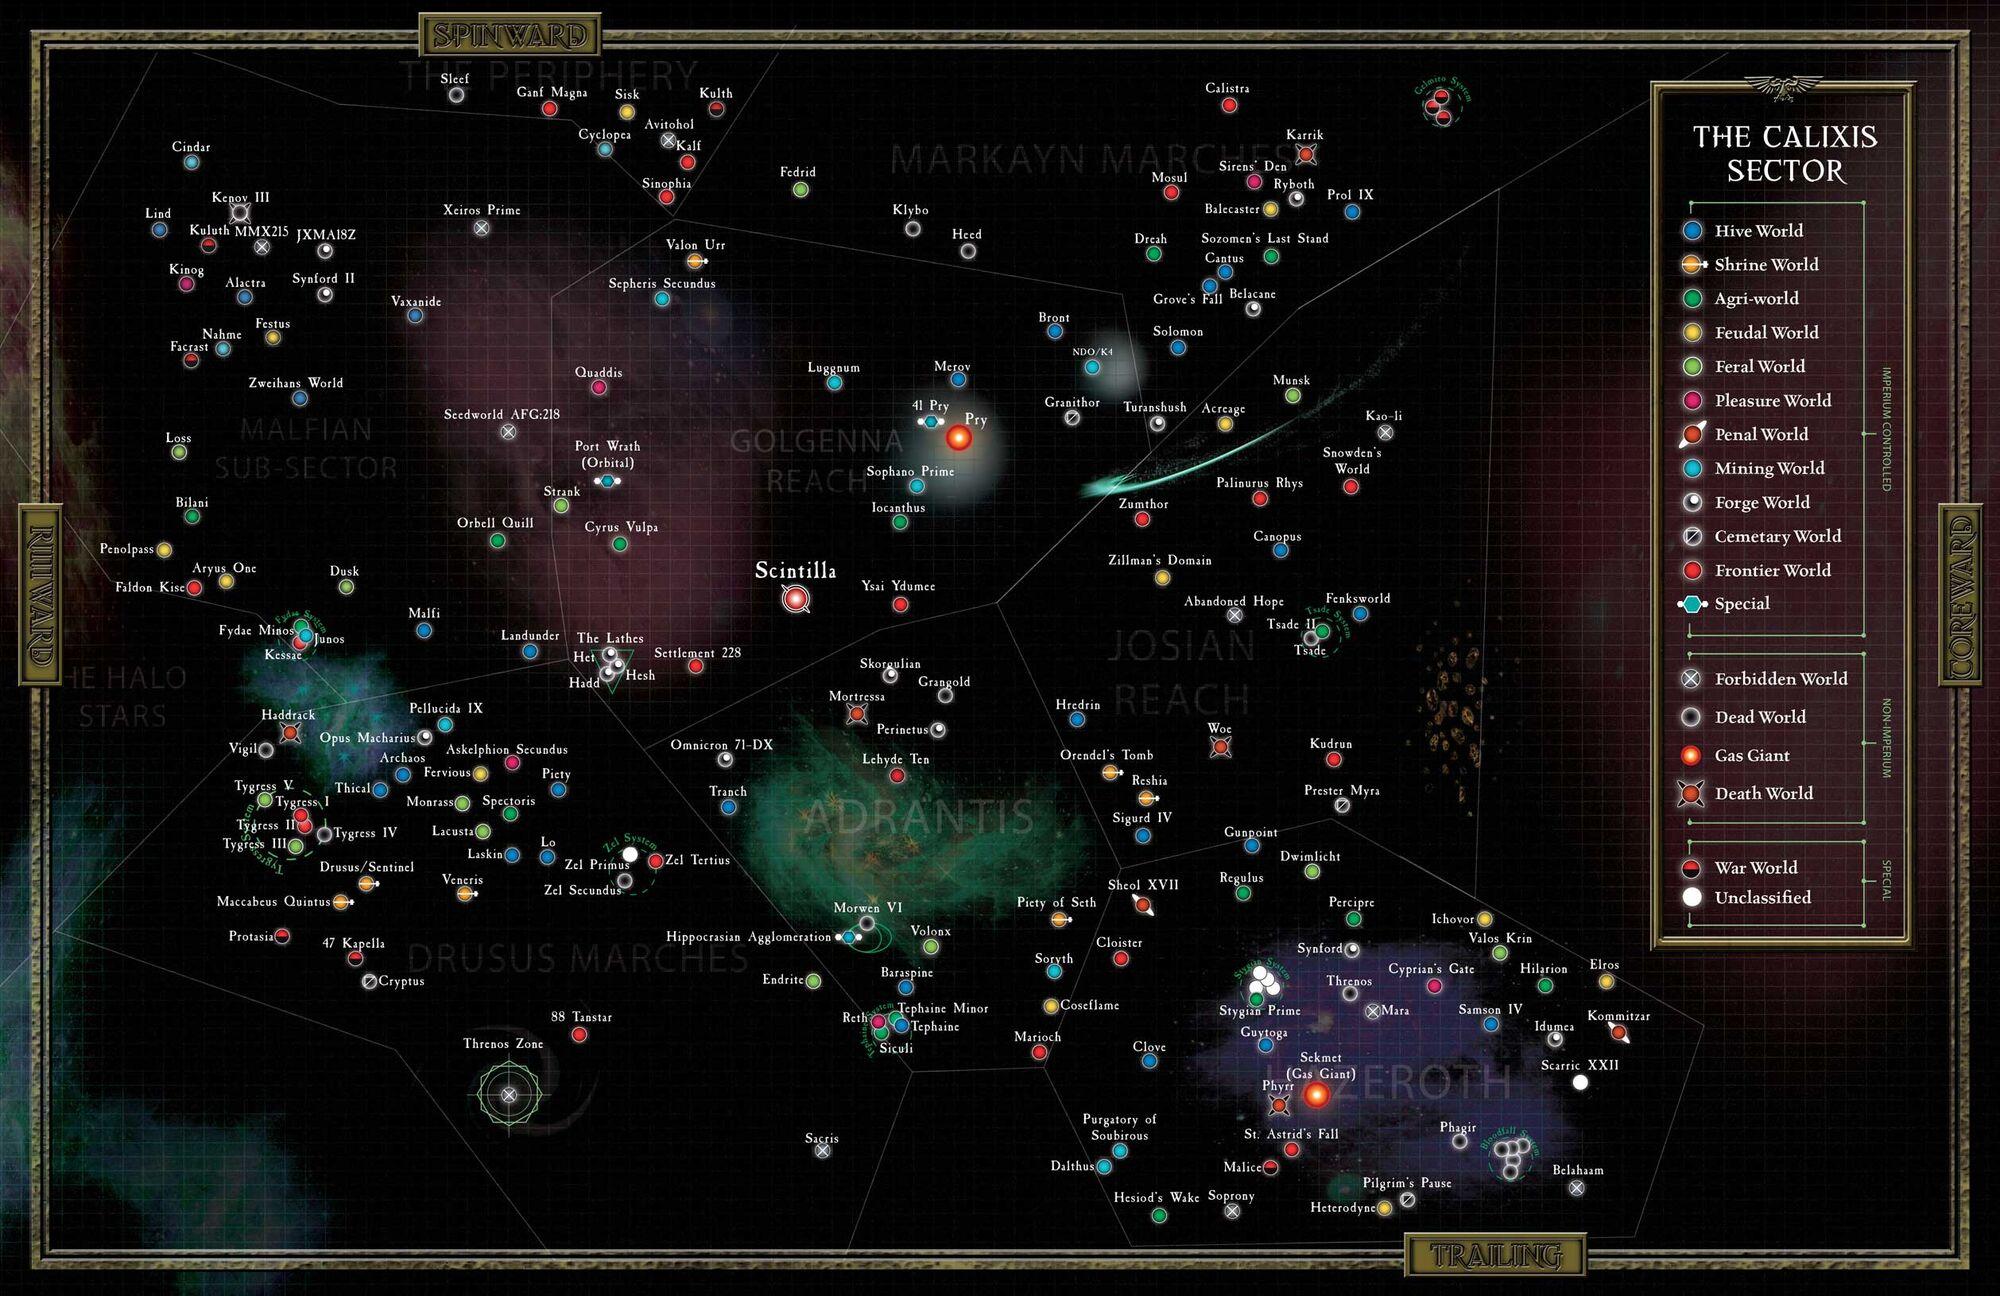 Titanics Short Li Halo 5 Epic Maps - BerkshireRegion